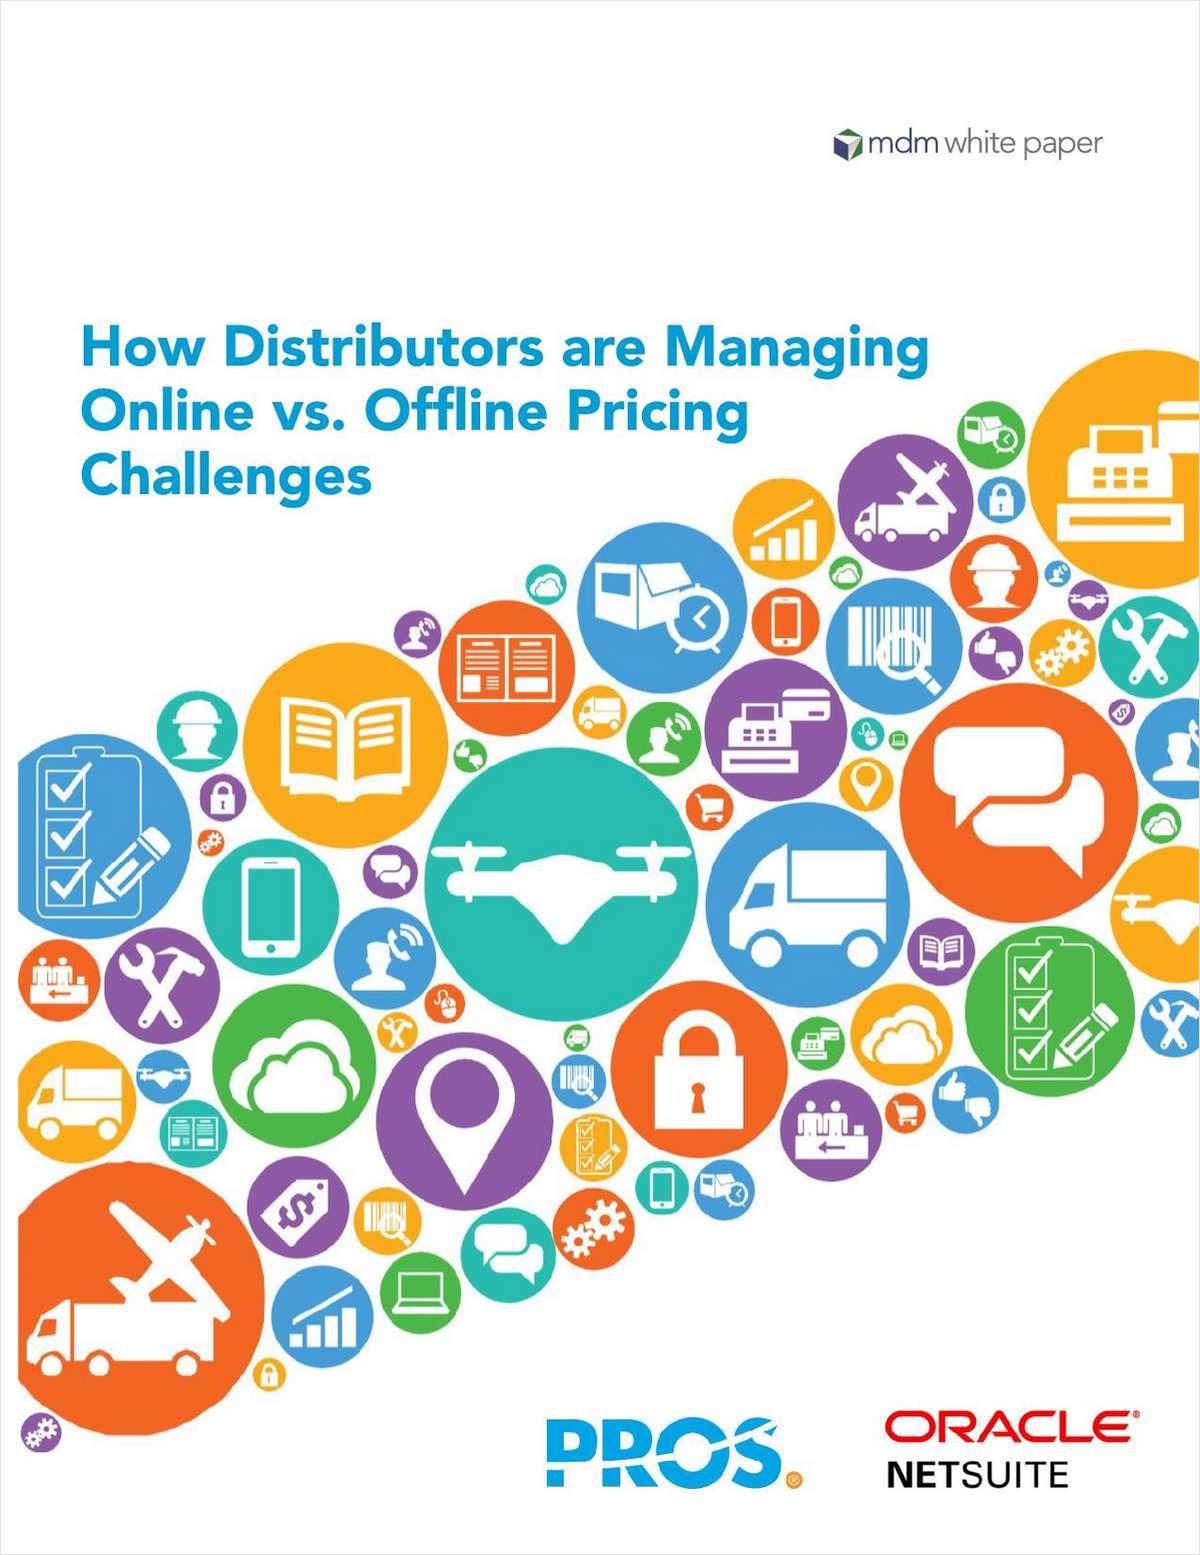 How Distributors are Managing Online vs Offline Pricing Challenges